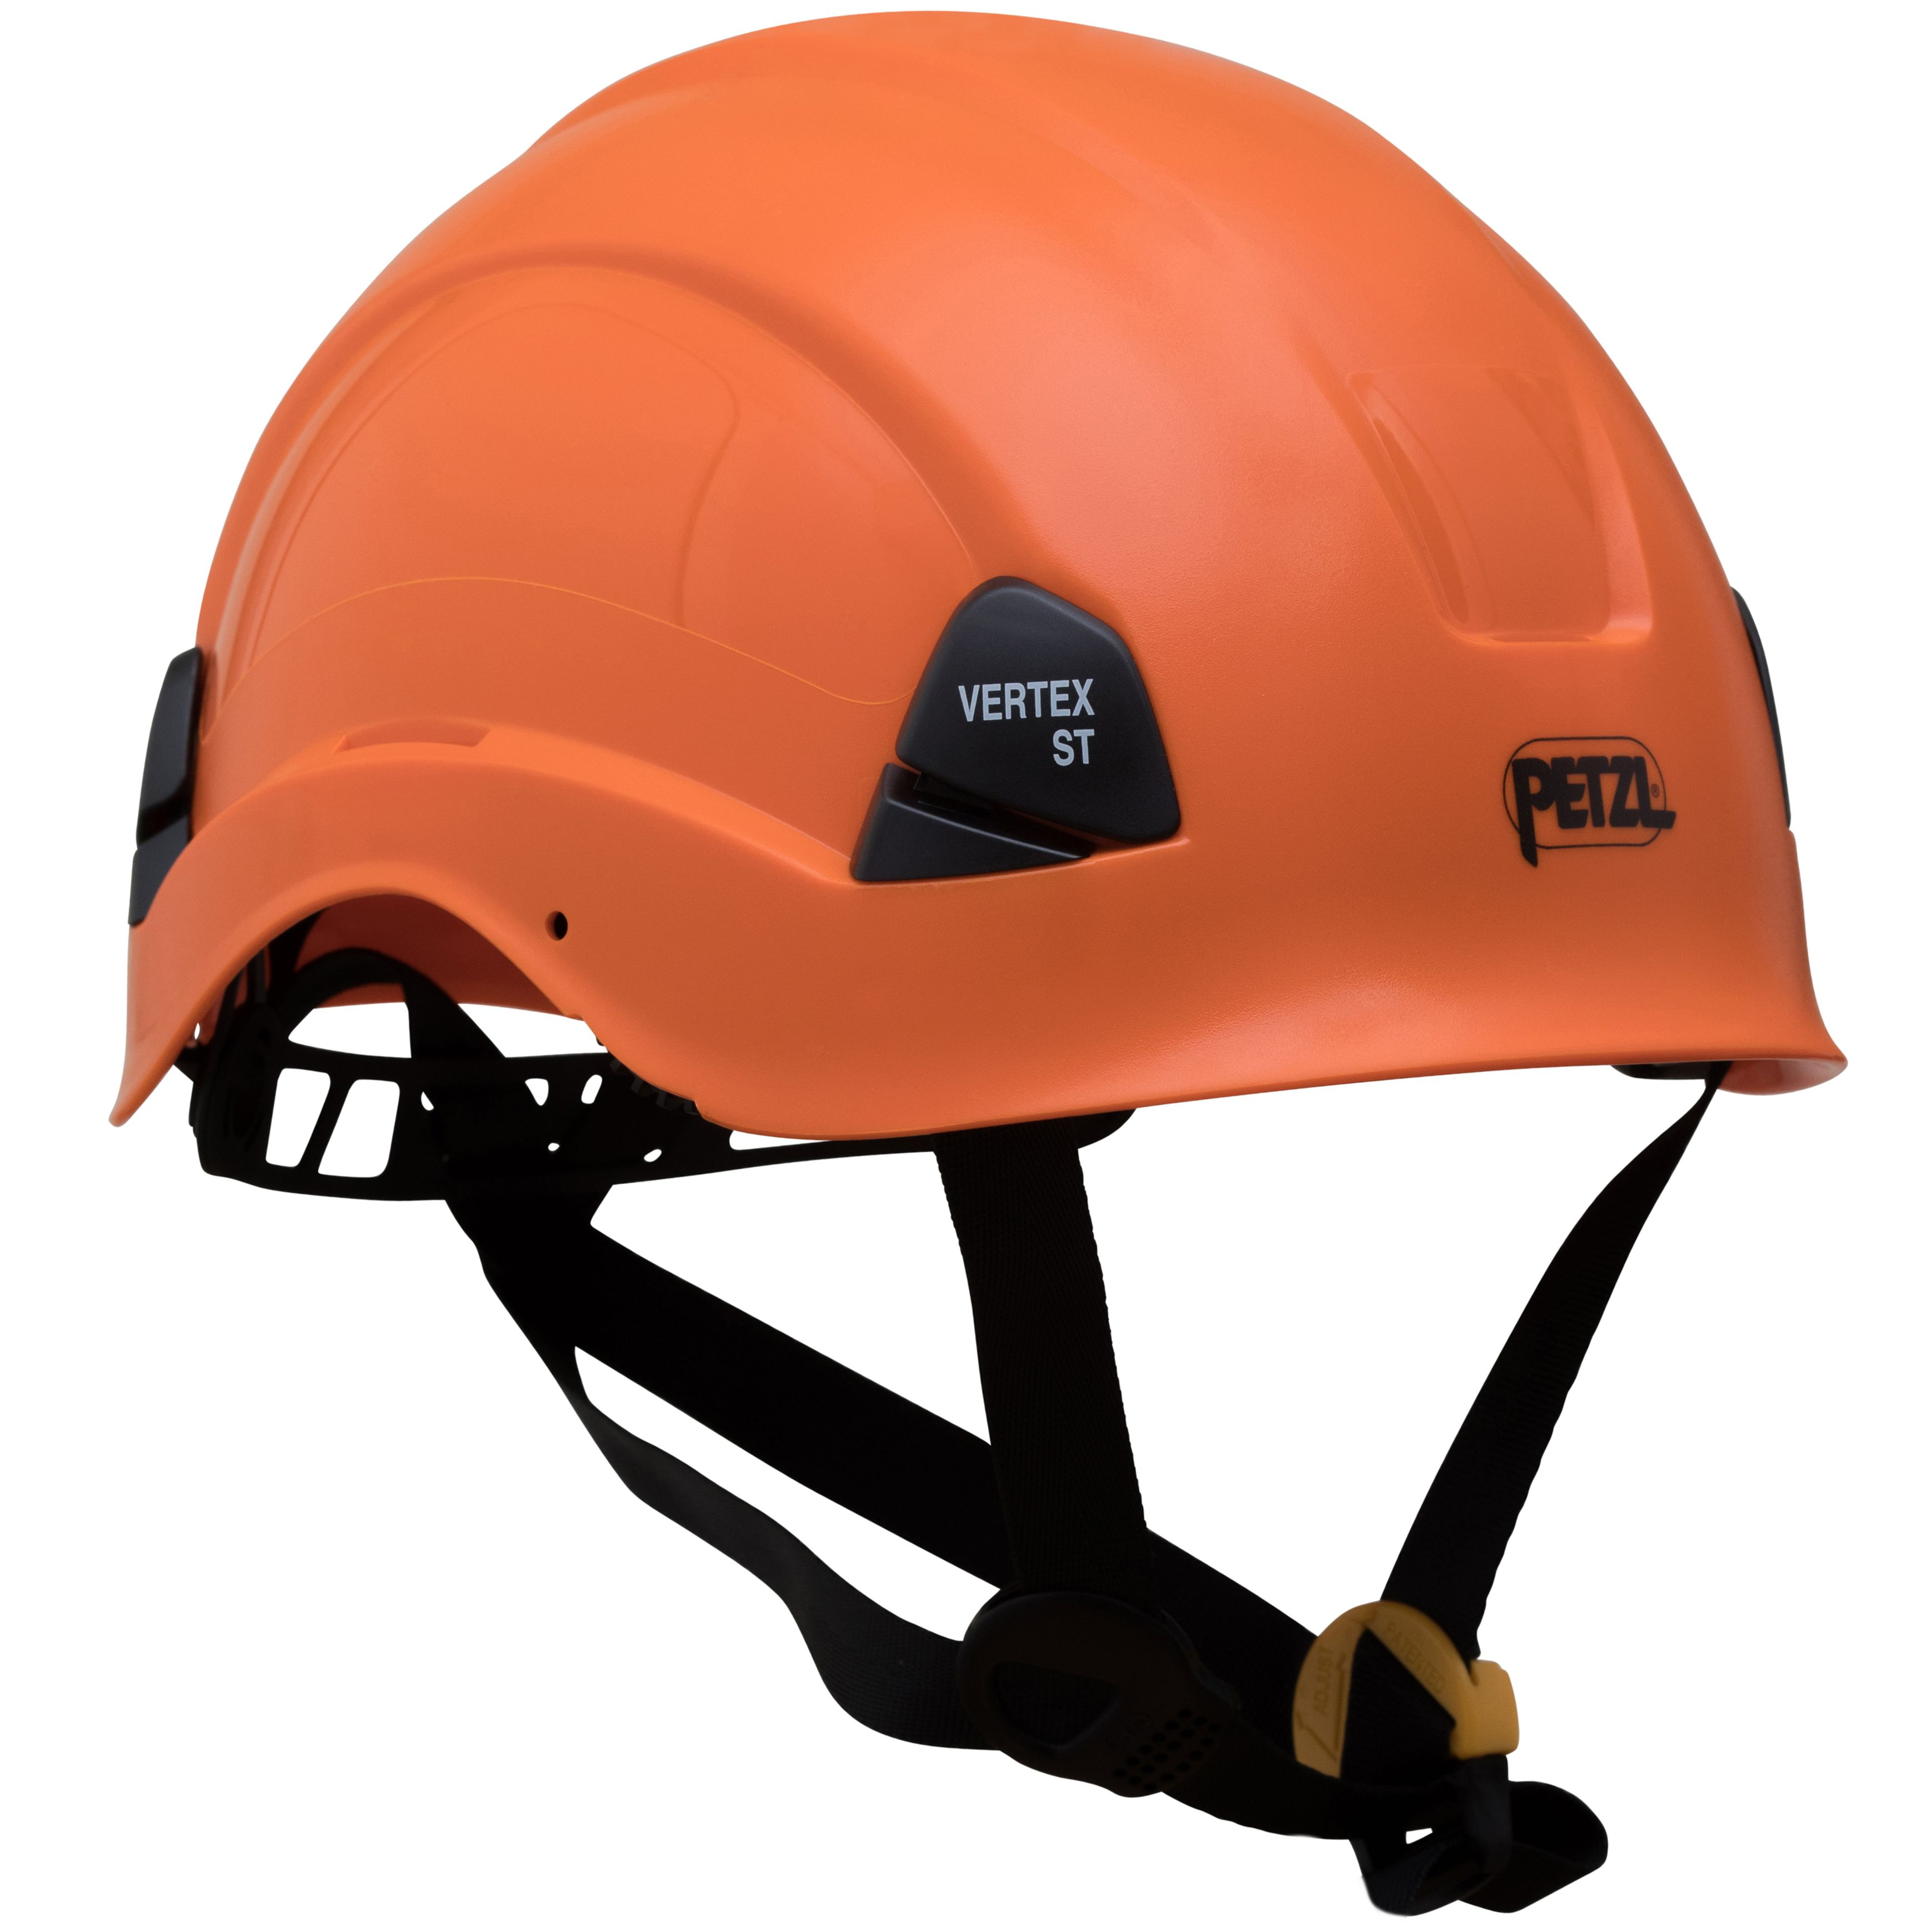 Petzl Vertex ST Skyddshjälm Orange